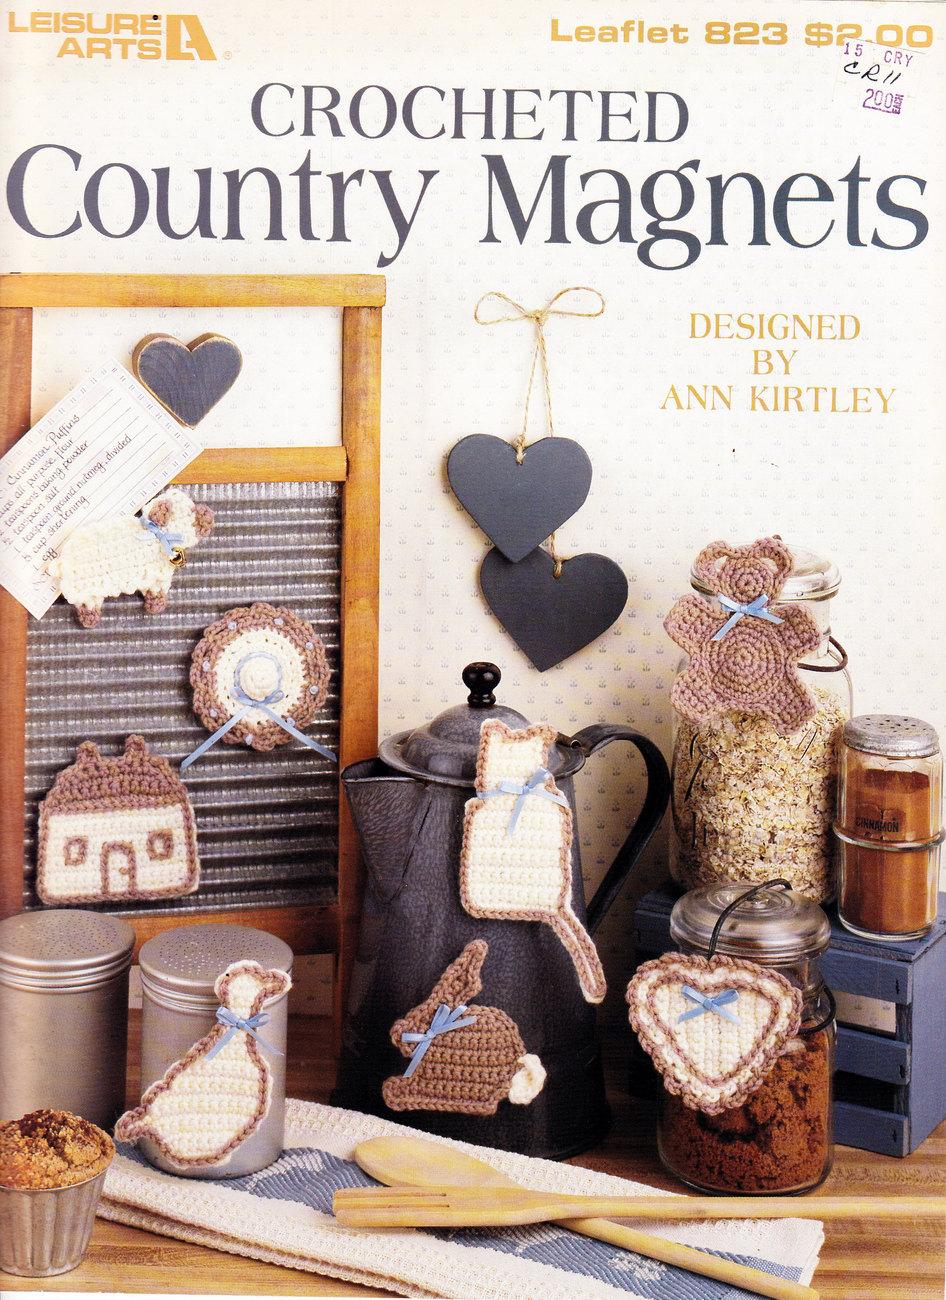 CROCHETED COUNTRY MAGNETS LEISURE ARTS LEAFLET 823 HEART, CAT, BONNET, LAMB, - $3.50